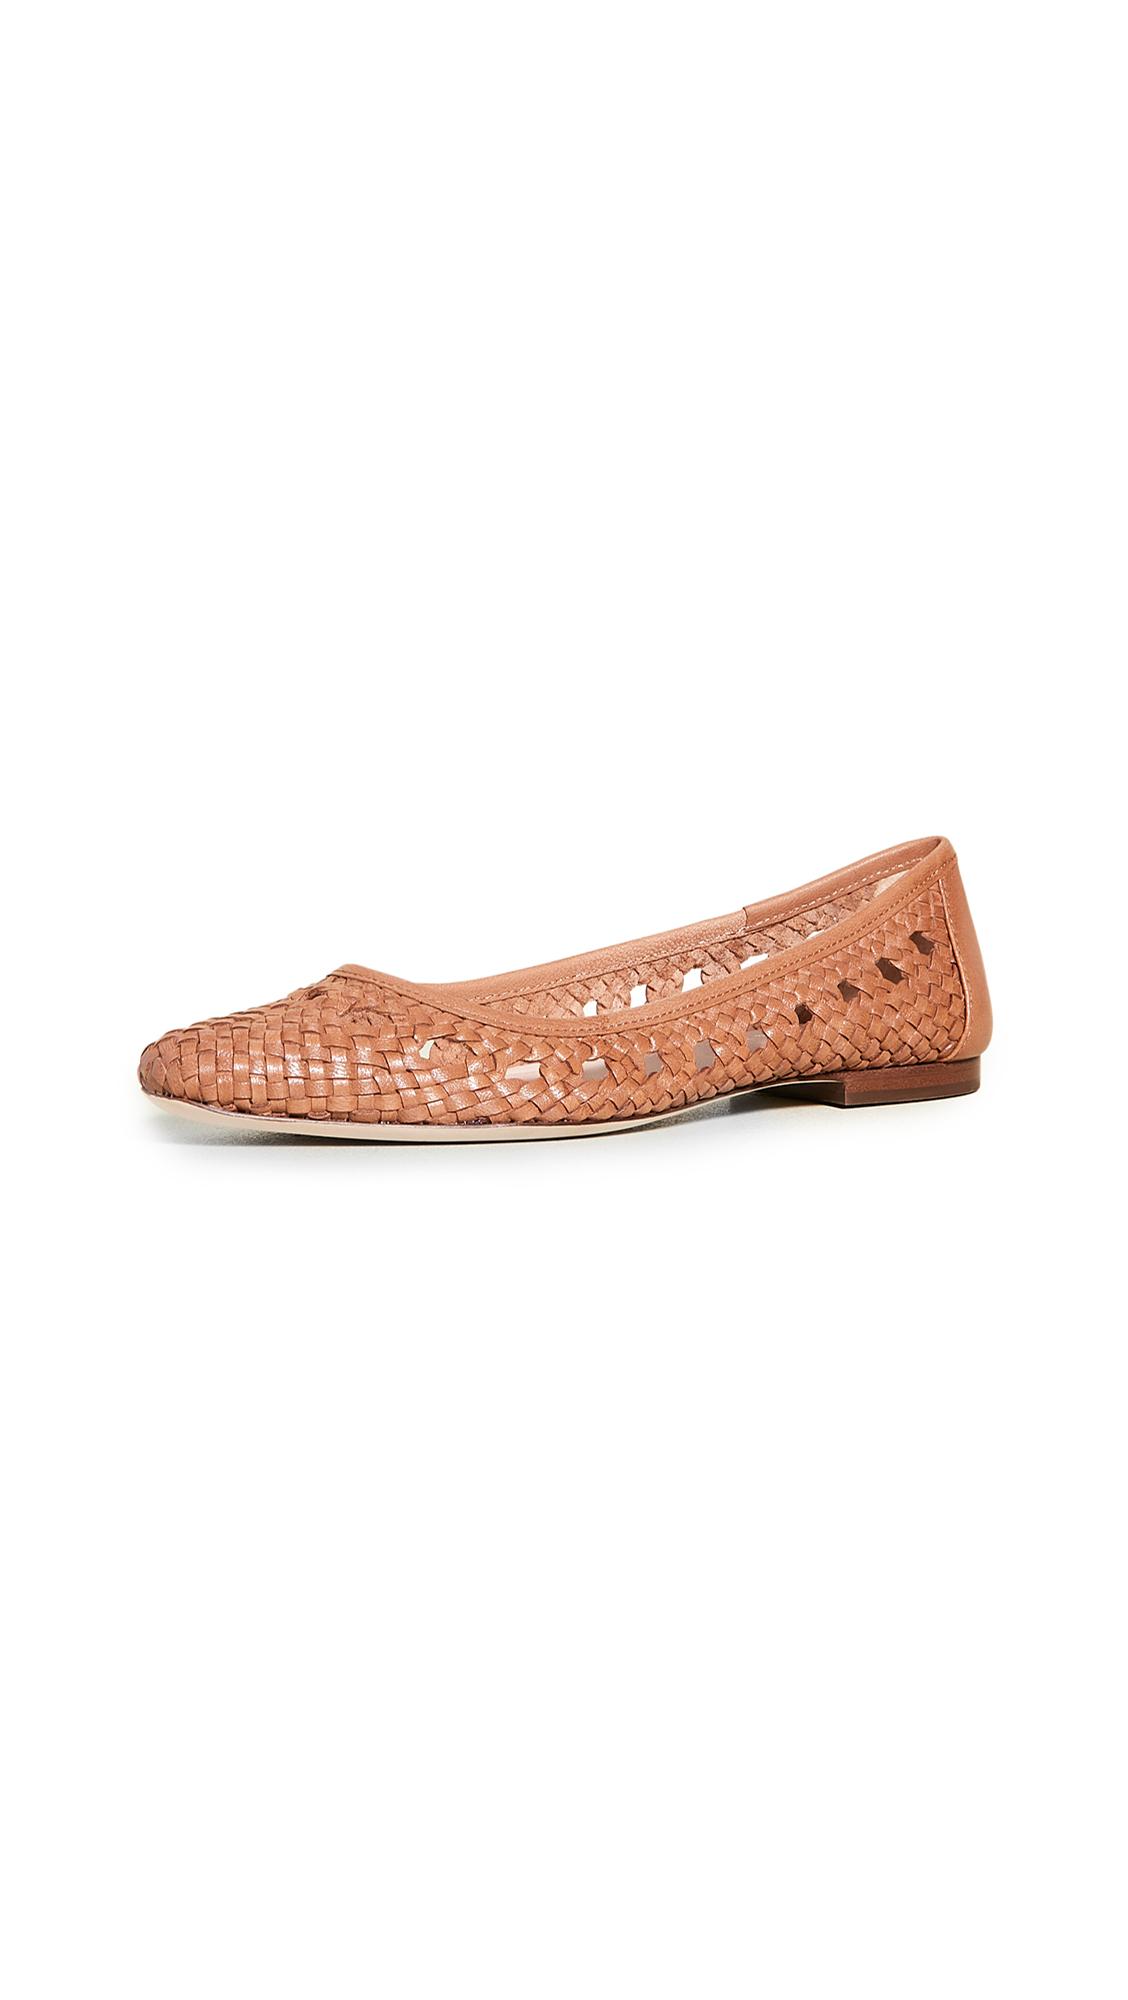 Buy Loeffler Randall Maura Woven Leather Ballet Flats online, shop Loeffler Randall